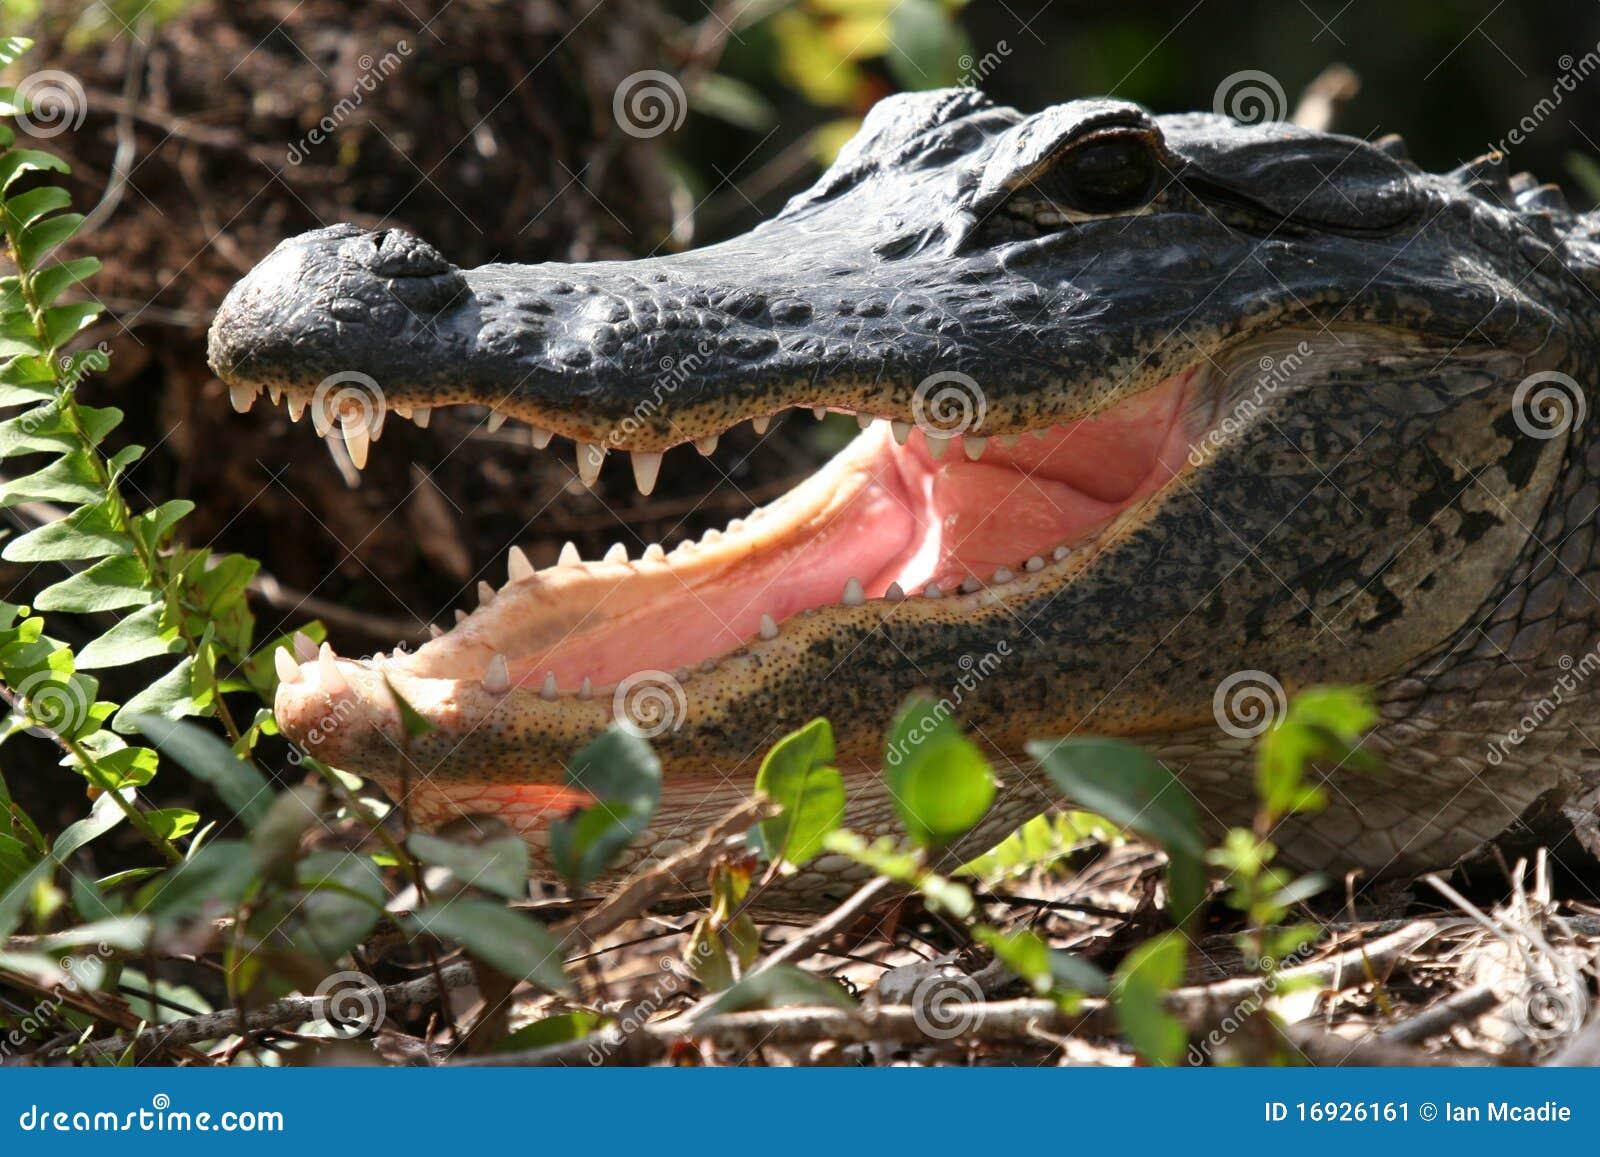 Alligator With ...